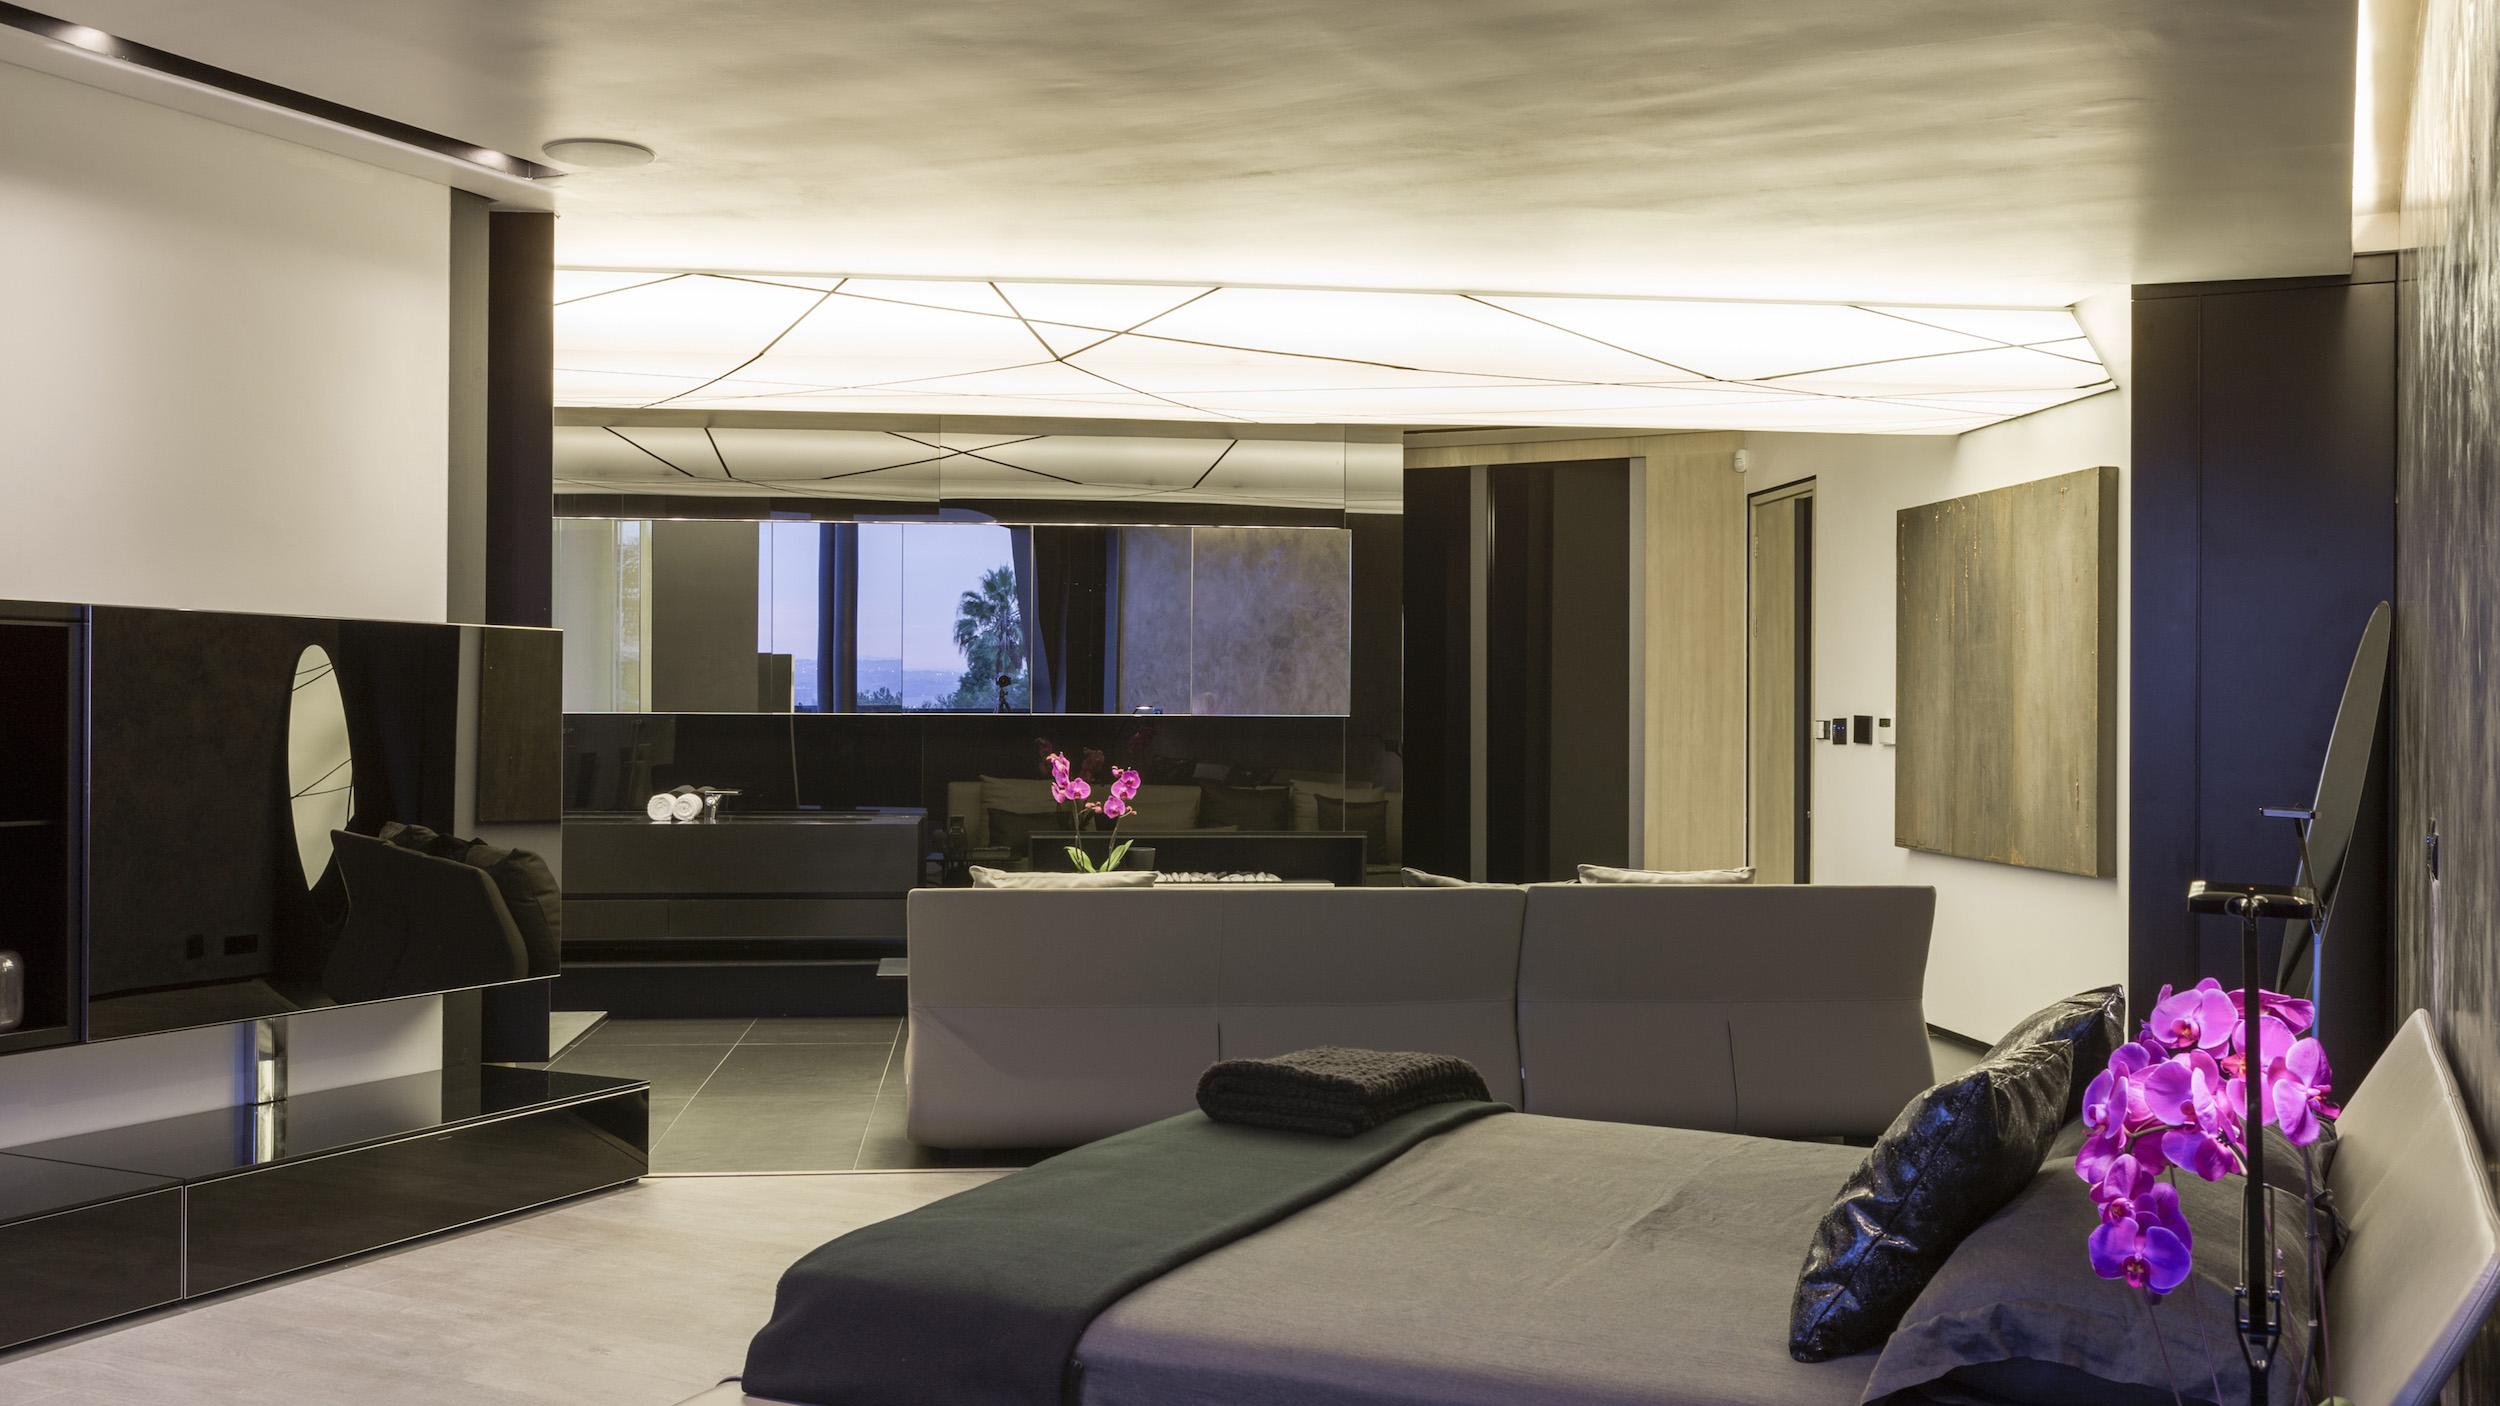 Kloof Road Masterpiece House in Johannesburg by Nico van der Meulen Architects-38